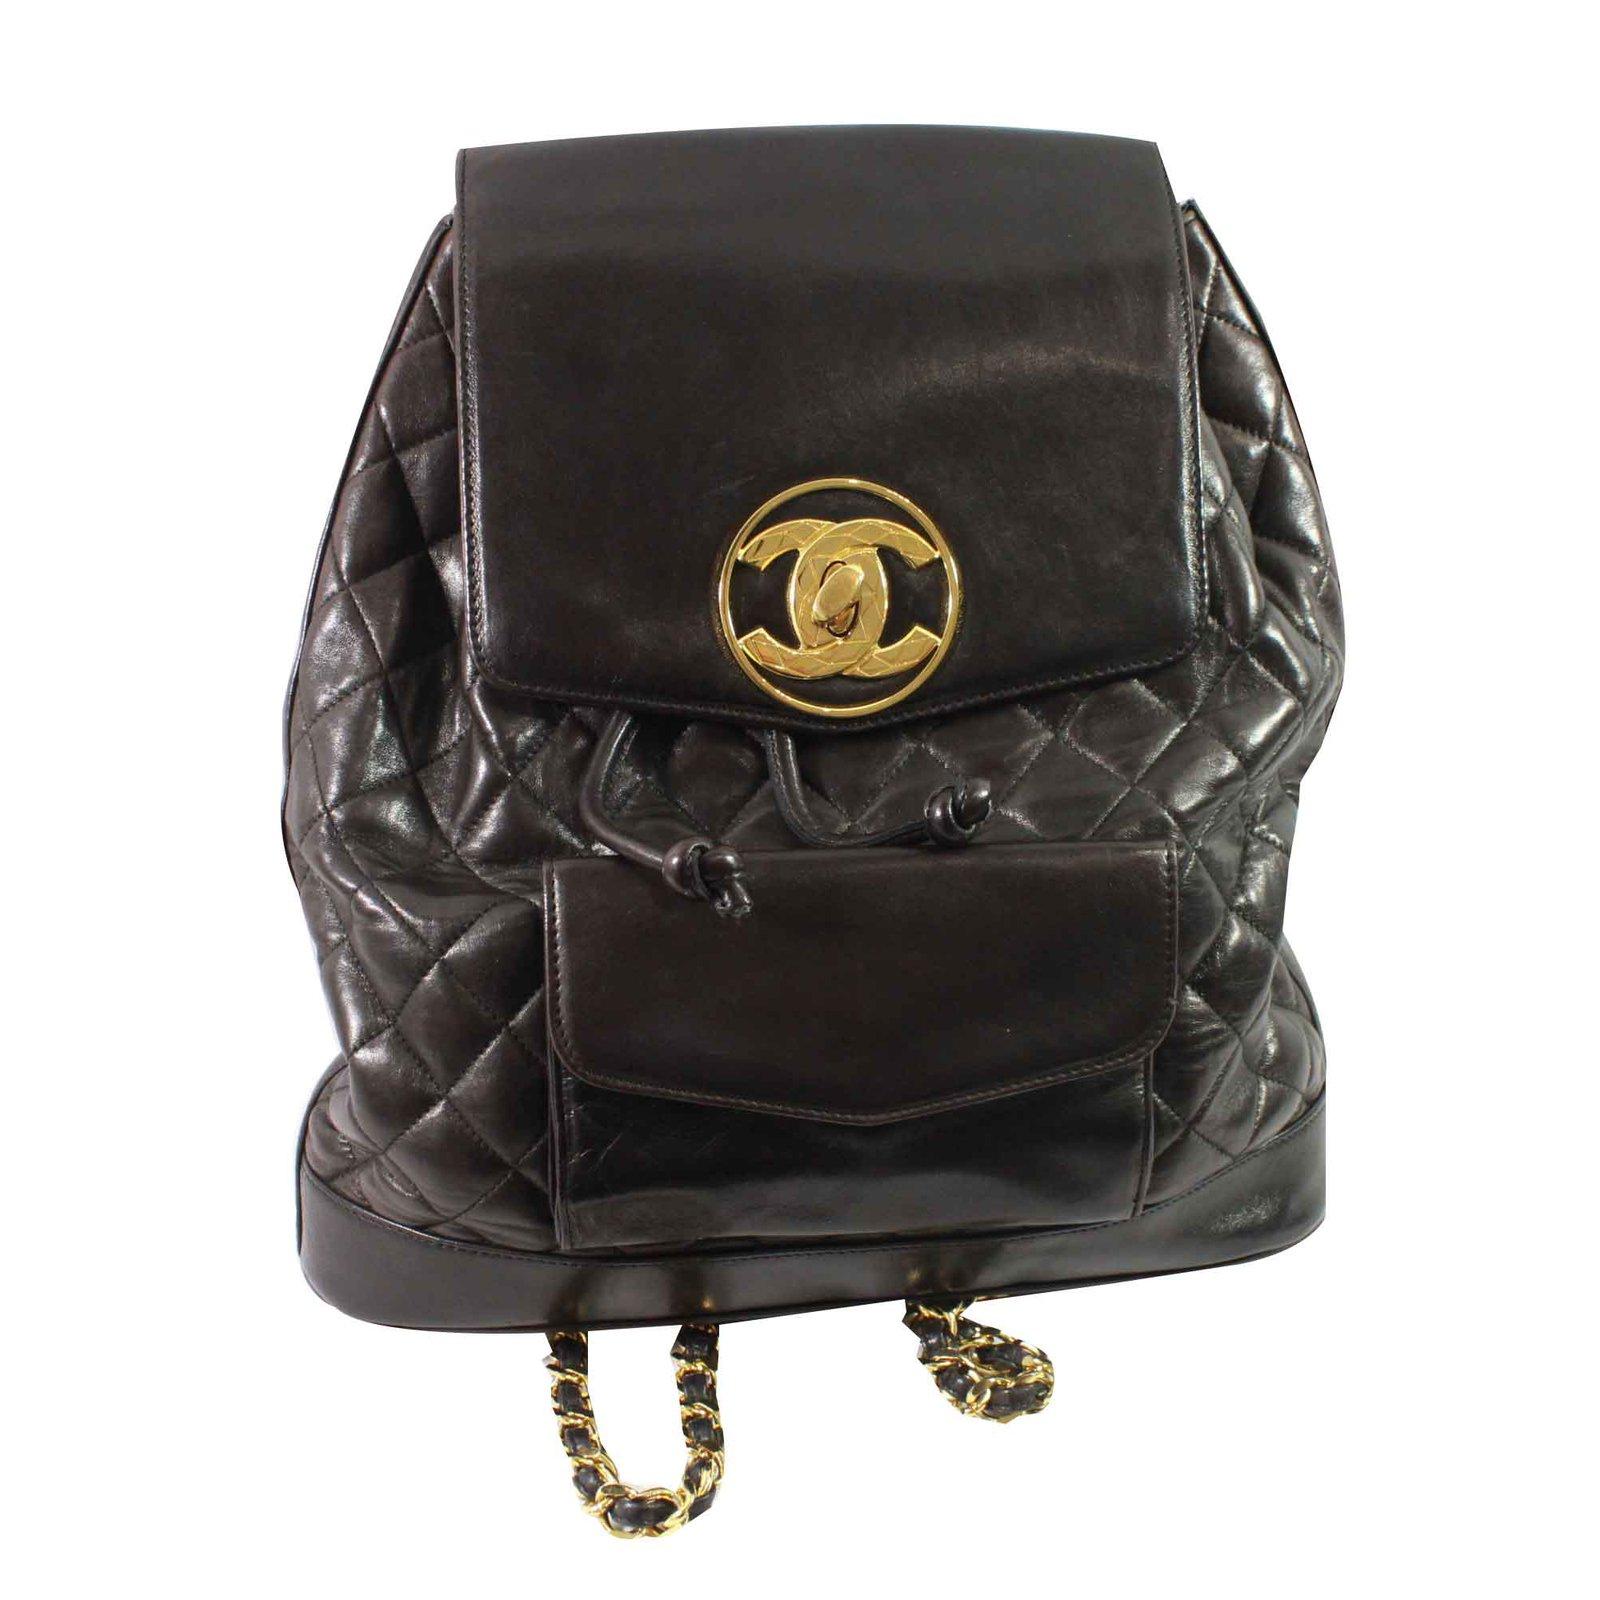 sacs dos chanel sac dos cuir marron joli. Black Bedroom Furniture Sets. Home Design Ideas